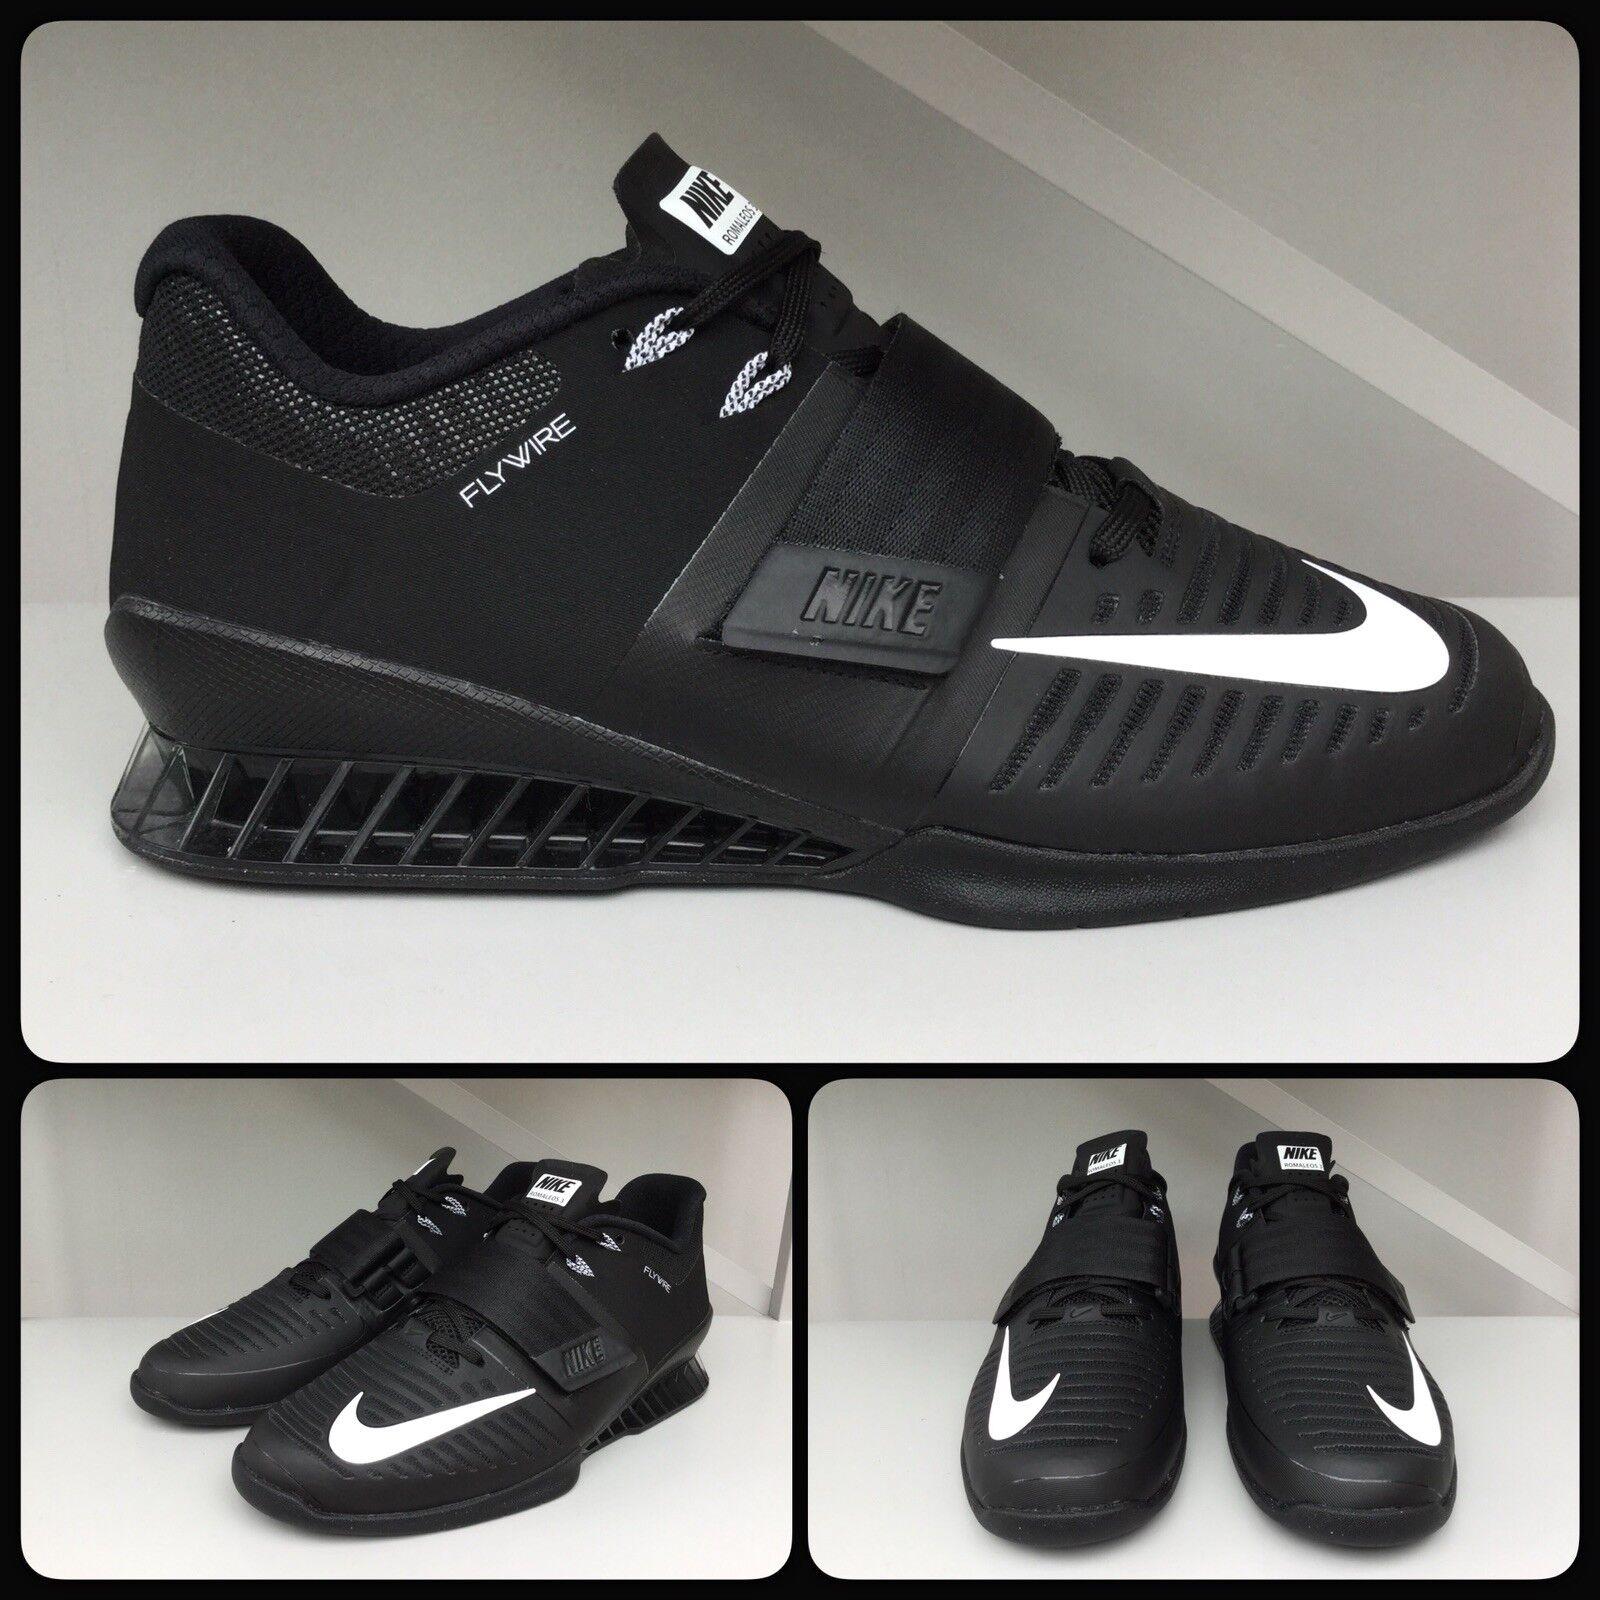 Nike Romaleos 3 weightlifting shoe, men Sz UK 7, EU 41, US 8, 852933-002